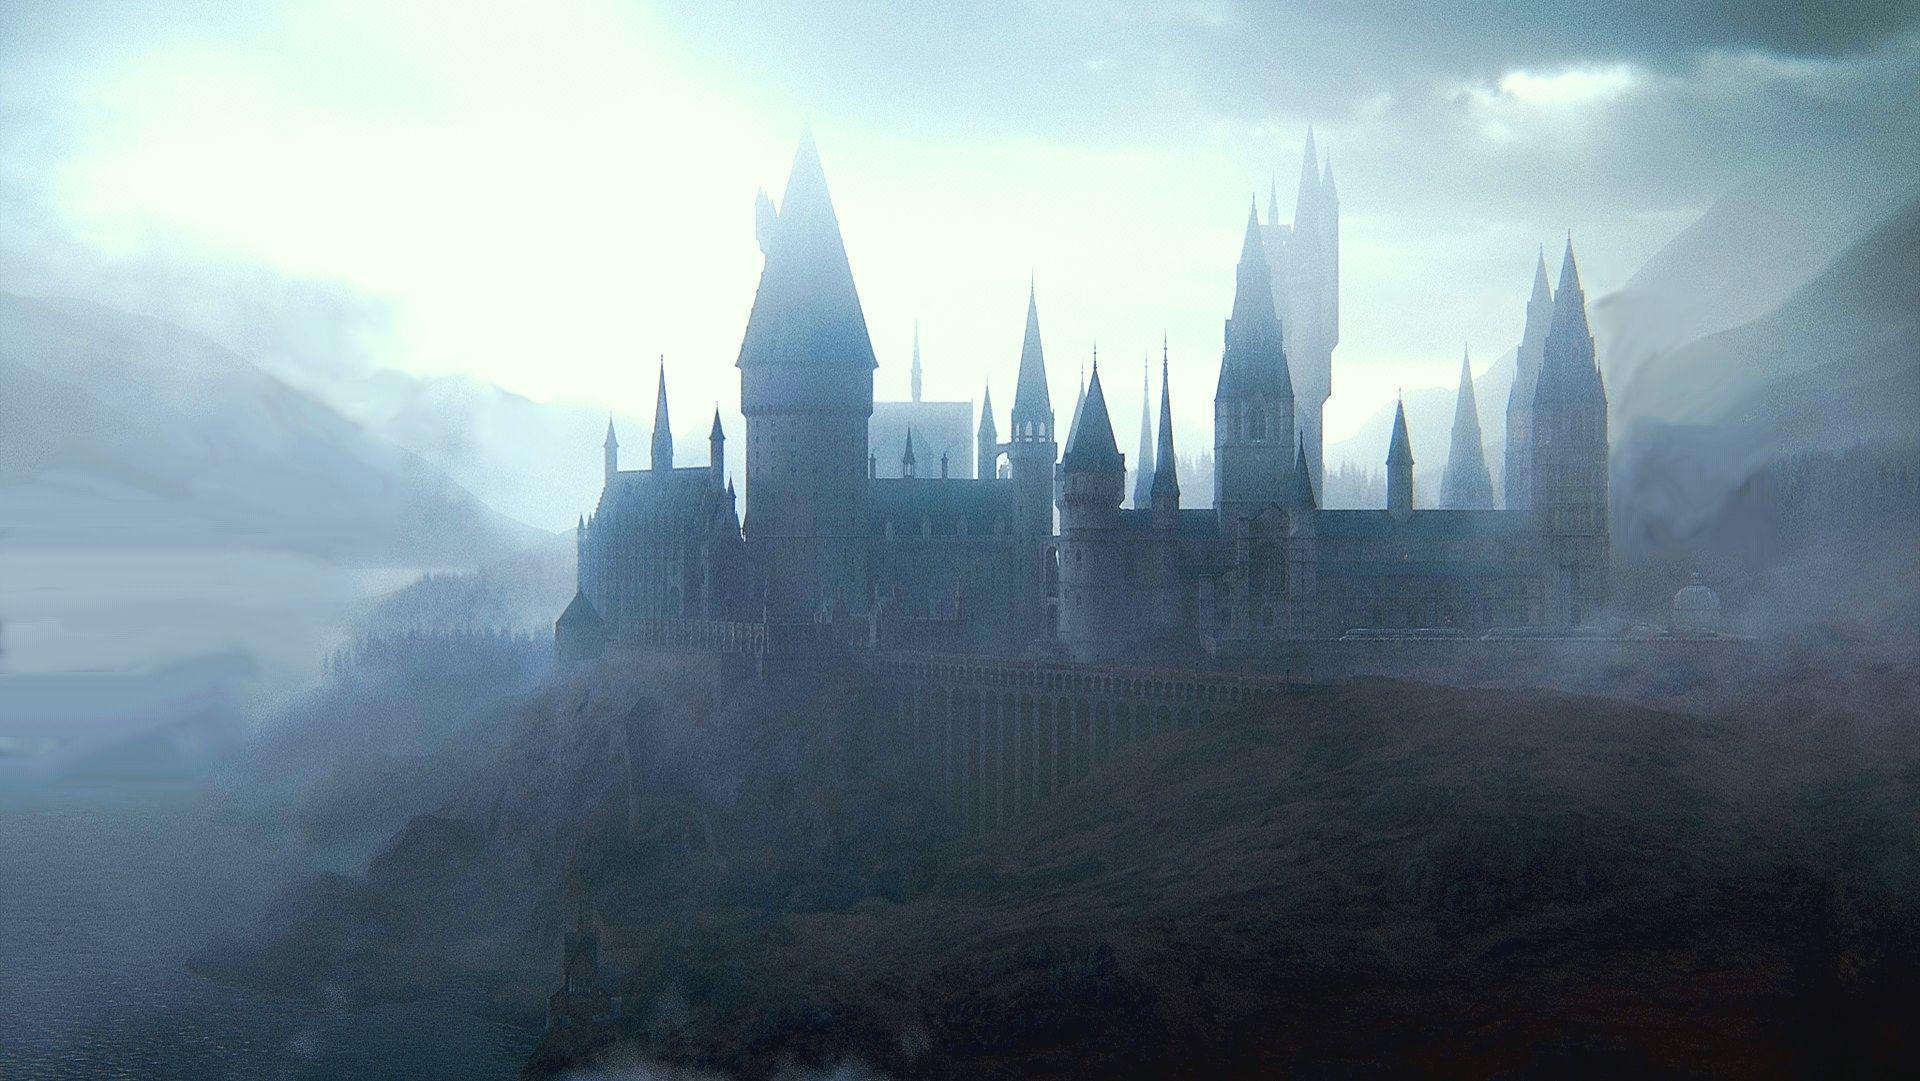 Hogwarts Harry Potter Wizarding School Jpg 1920 1081 Harry Potter Bildschirmhintergrund Harry Potter Pc Harry Potter Hintergrund